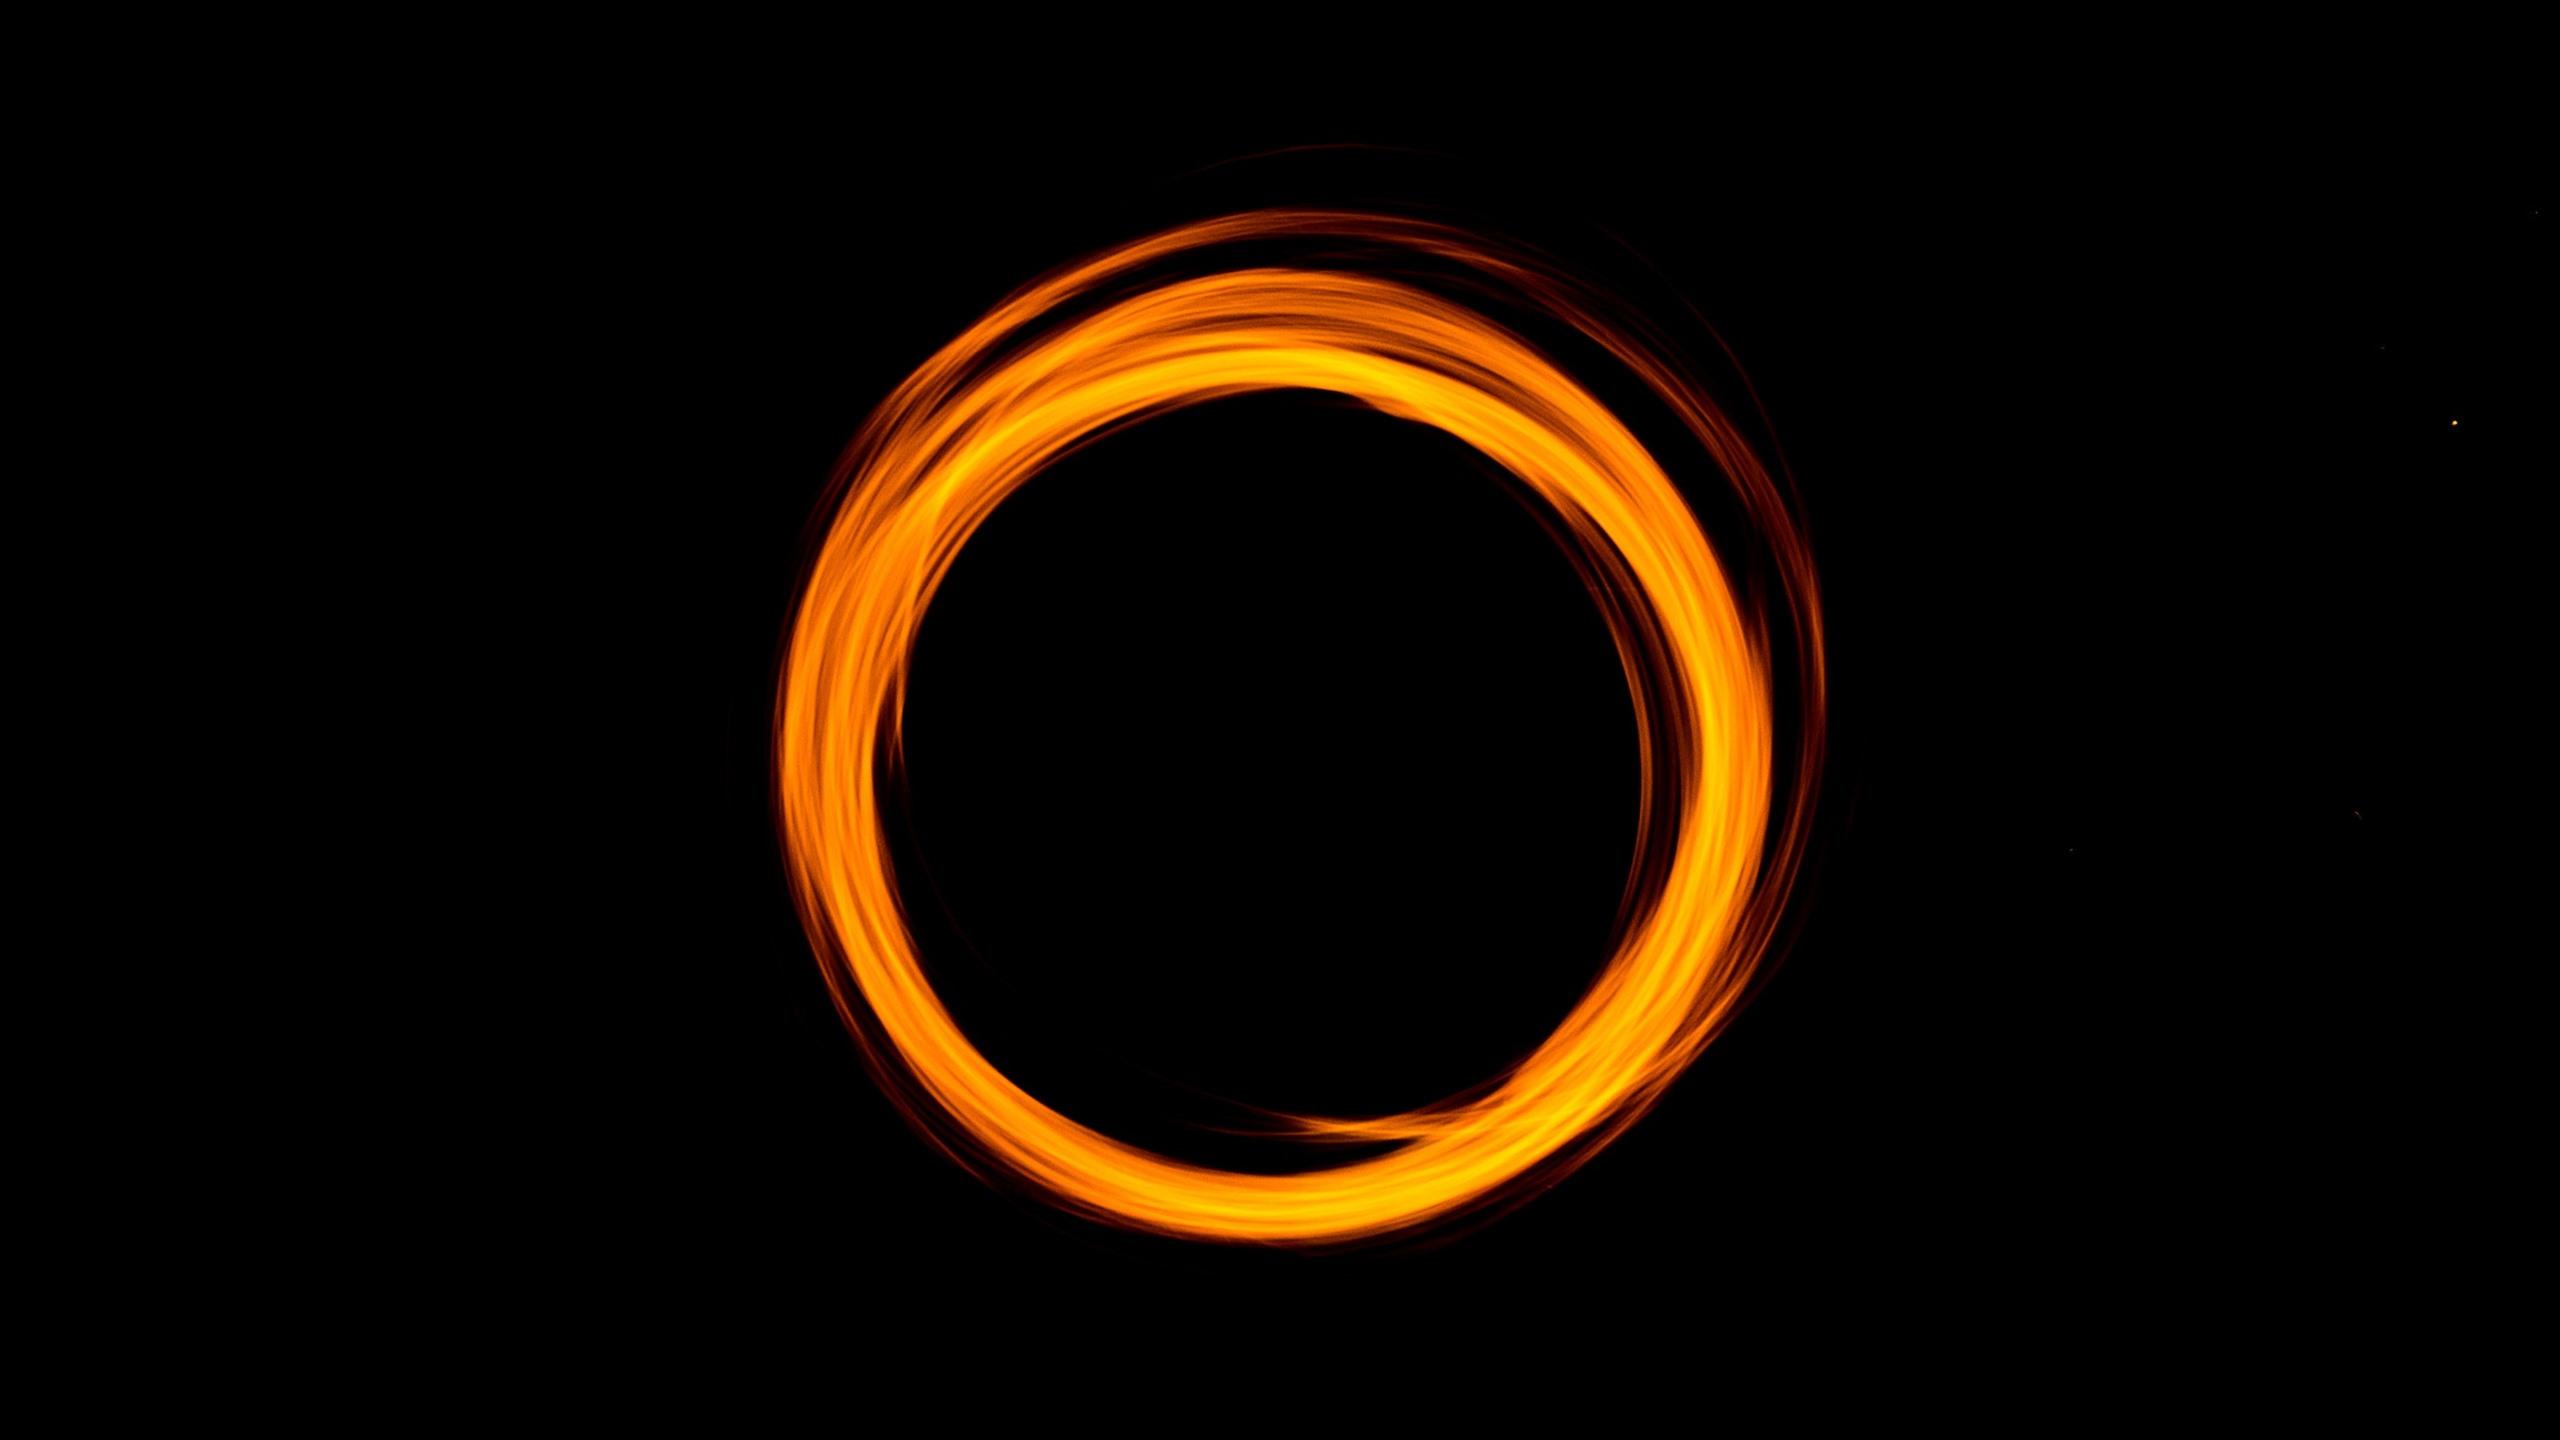 Wallpaper Orange Light Circle Black Background 2880x1800 Hd